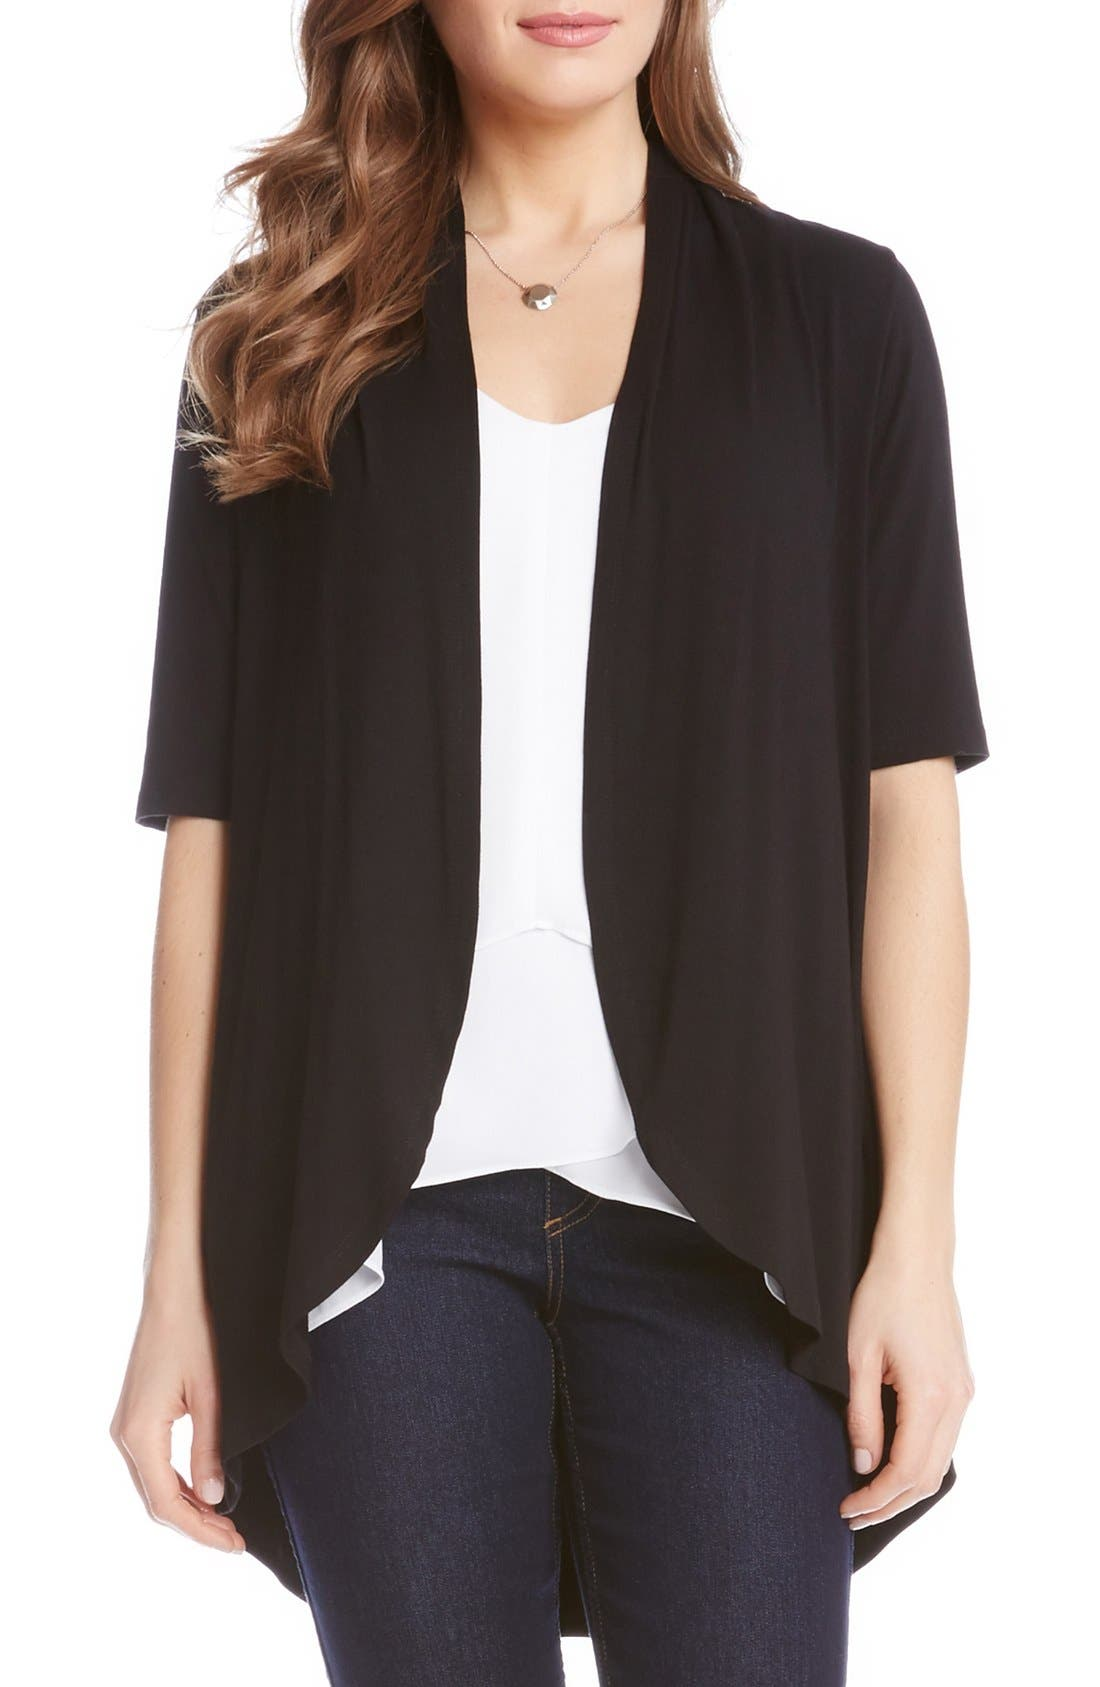 Women's Black Short Sleeve Cardigan Sweaters | Nordstrom